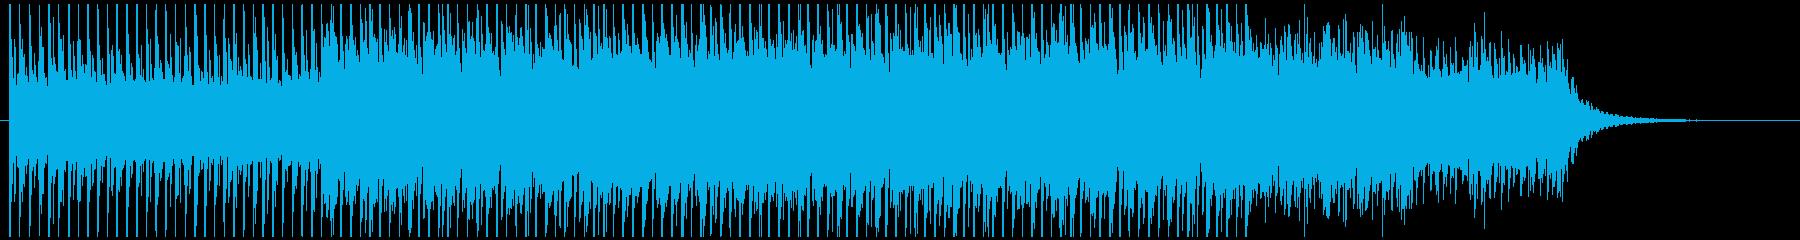 【TV・ラジオ】エレクトロBGMの再生済みの波形